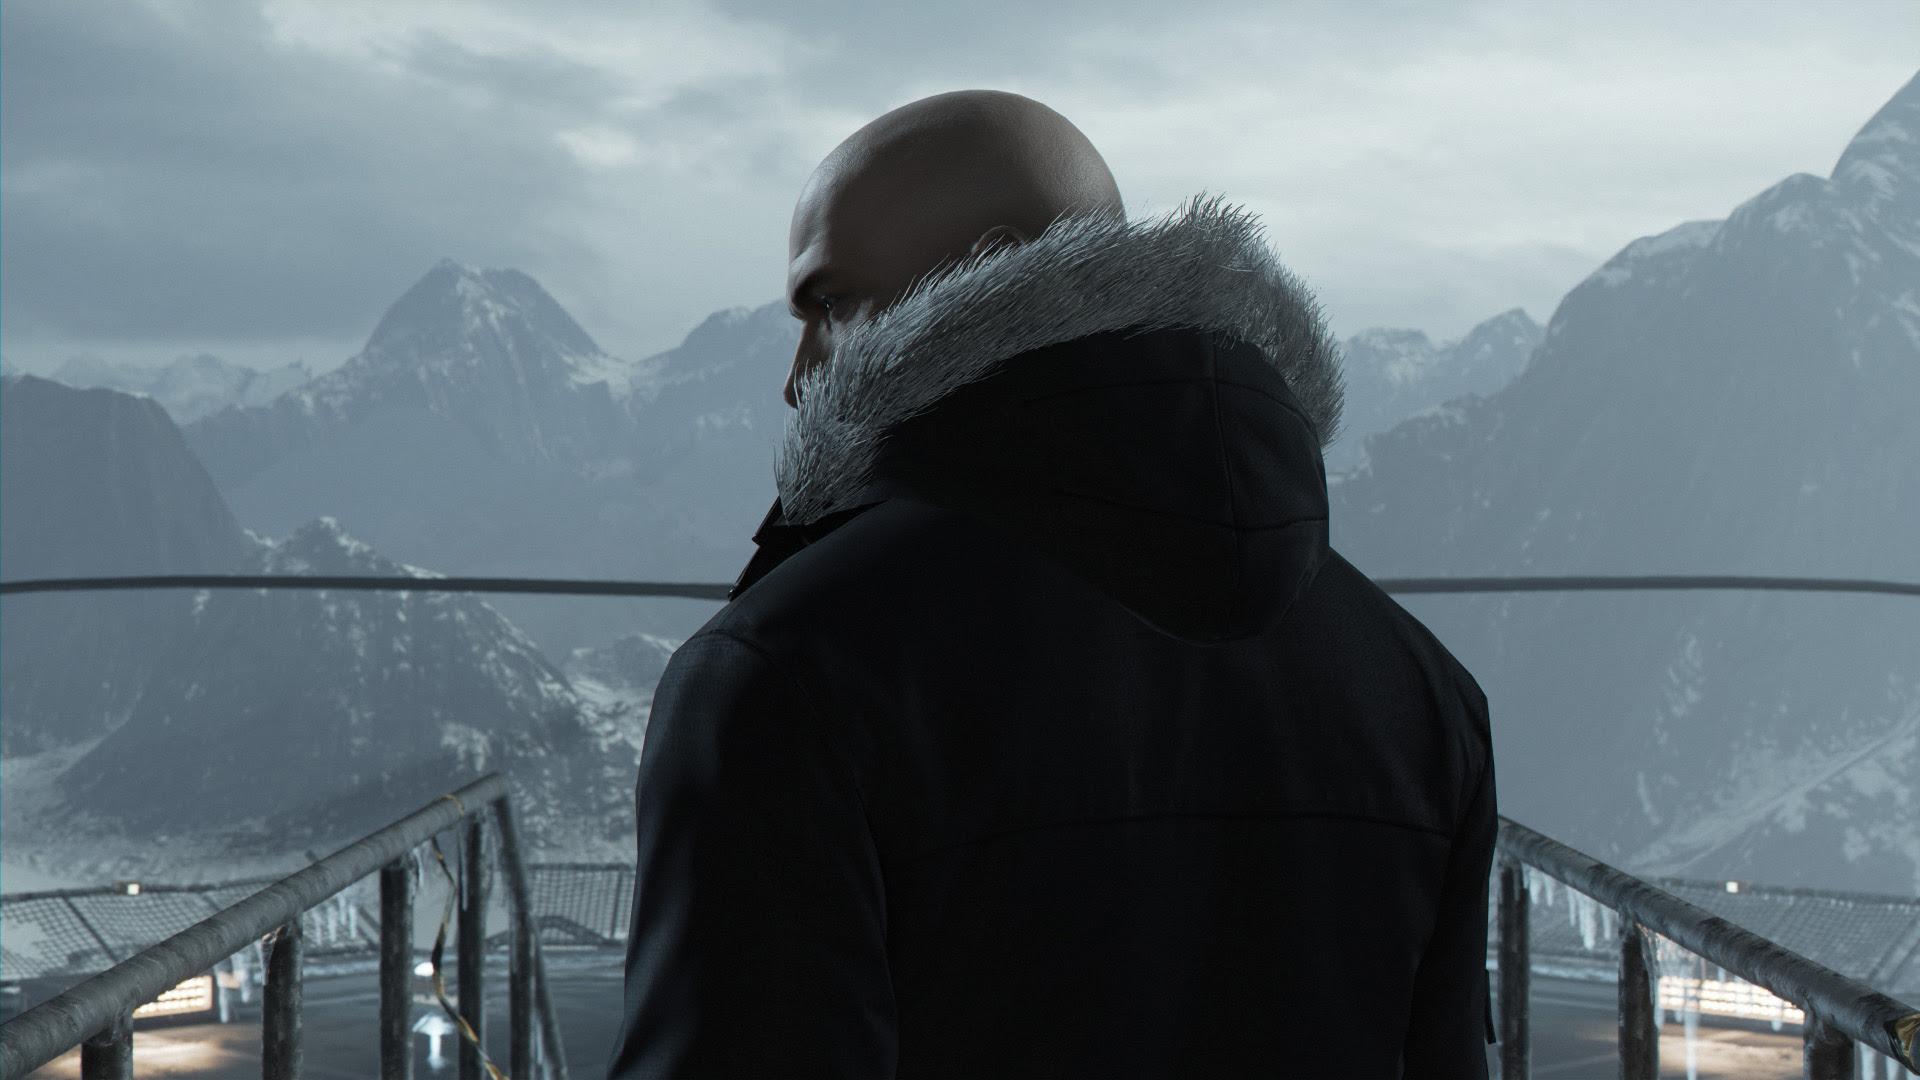 [UPDATE:] Square Enix breaks up with Hitman developer IO Interactive screenshot